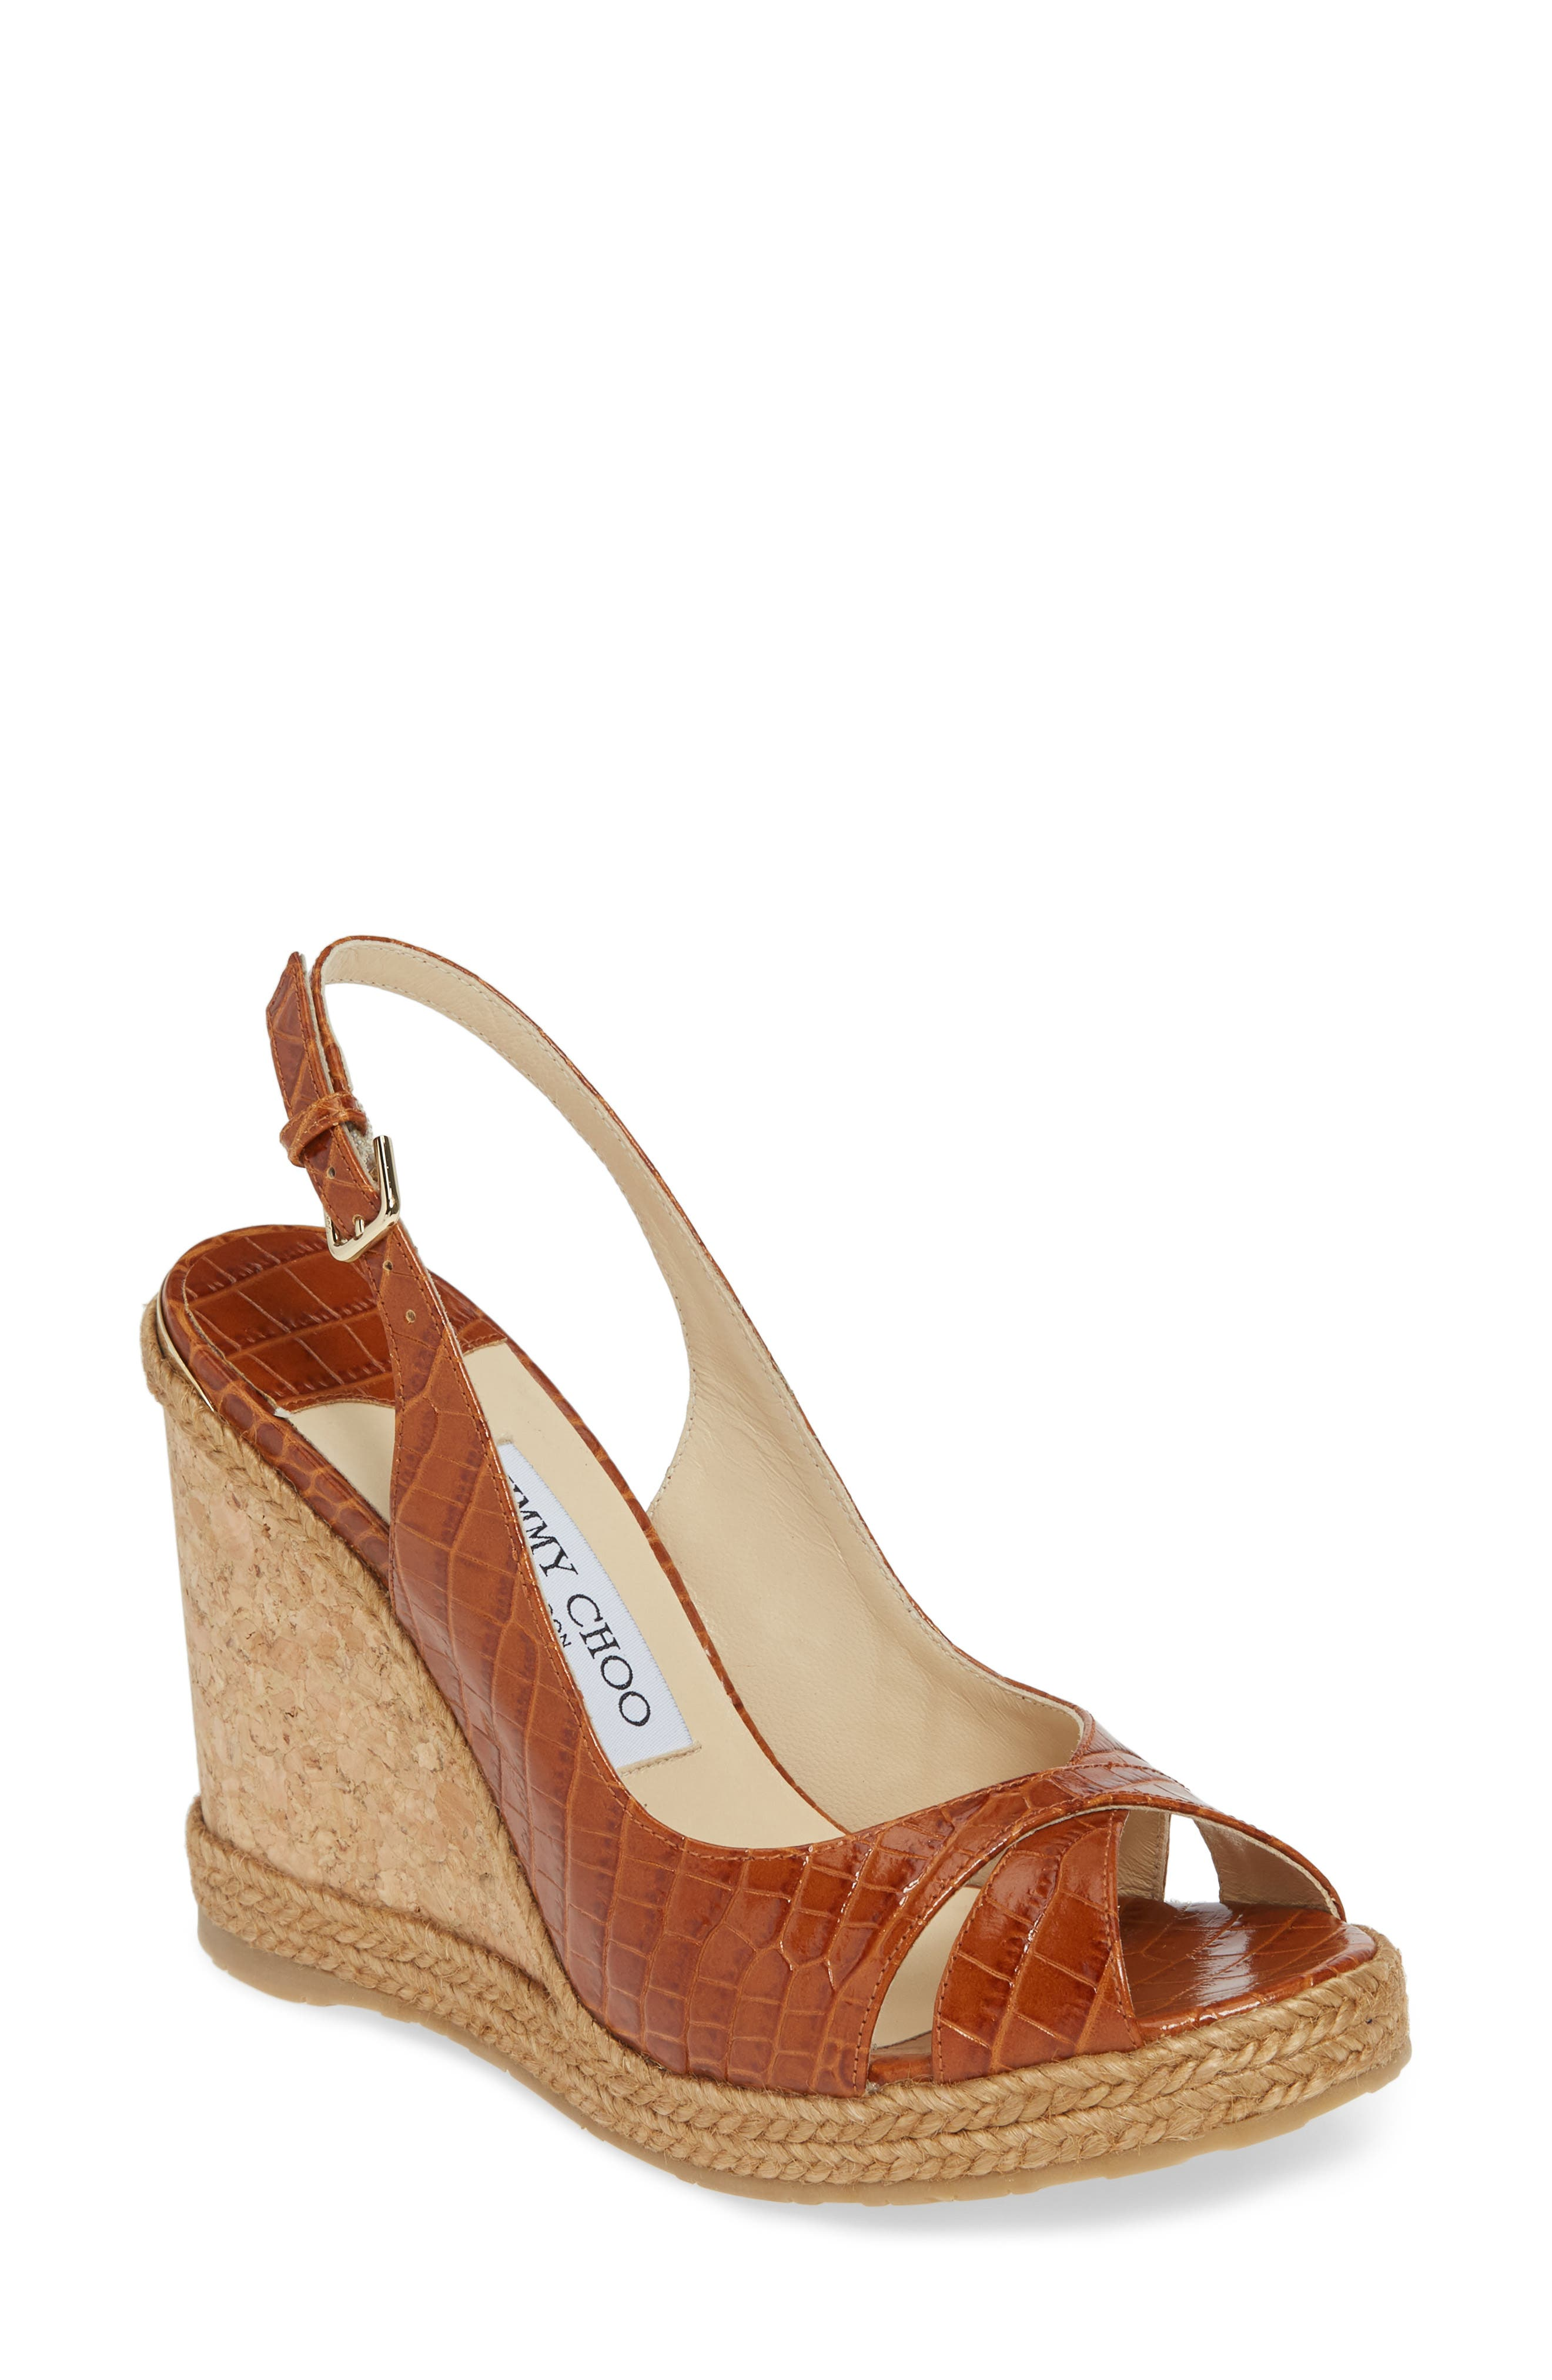 fa692d3fdac Jimmy Choo Women s Wedge Shoes